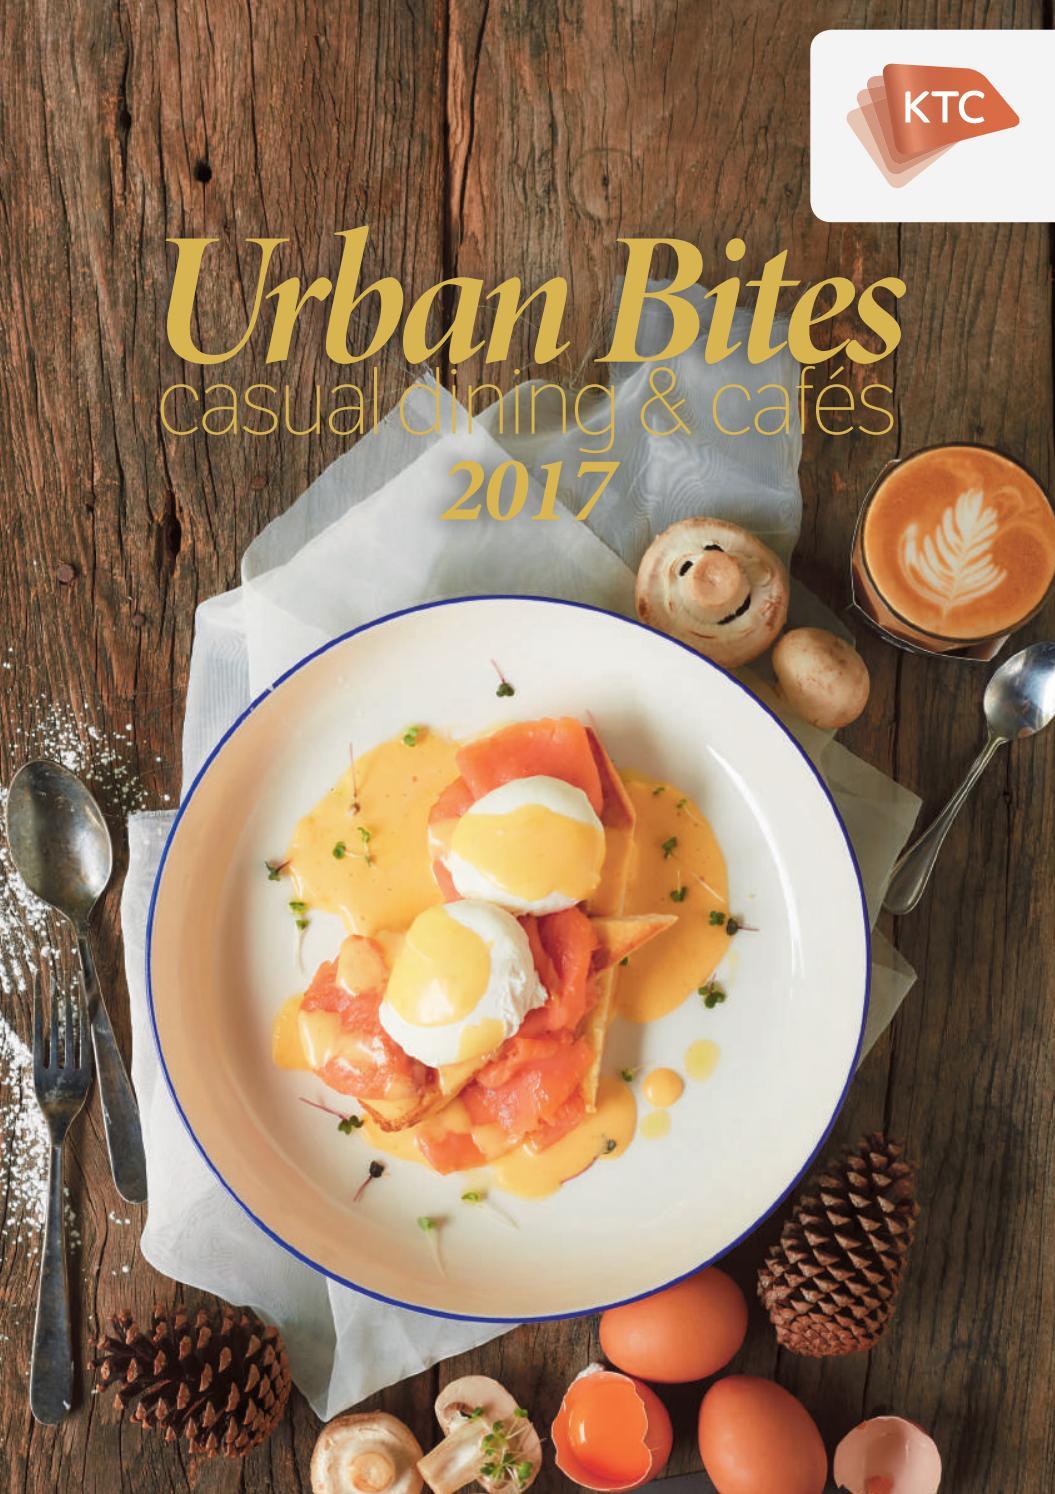 KTC Urban Bites by Asia City Media Group (Thailand) - issuu